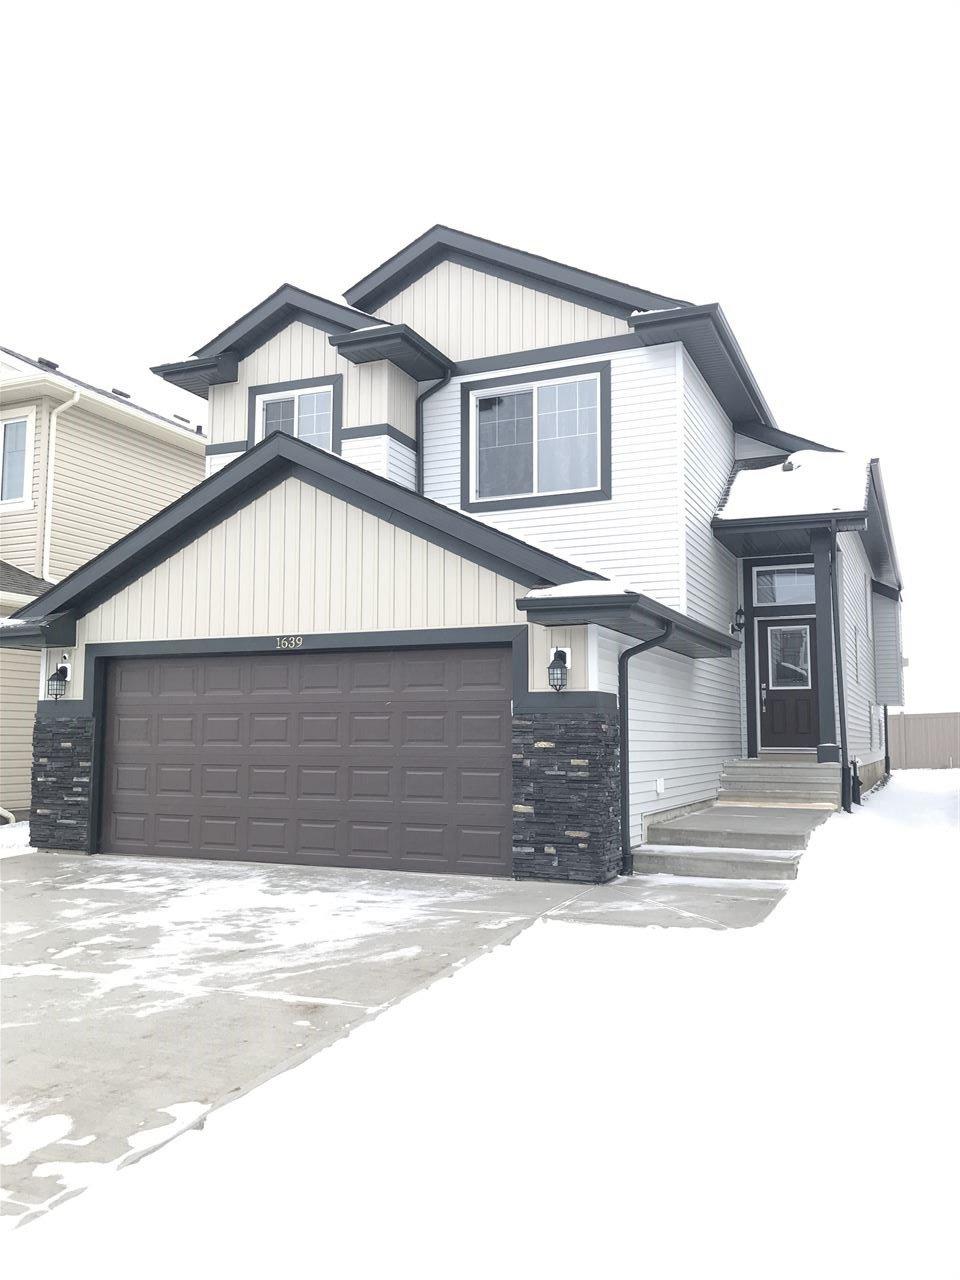 Main Photo: 1639 18 Street in Edmonton: Zone 30 House for sale : MLS®# E4145016